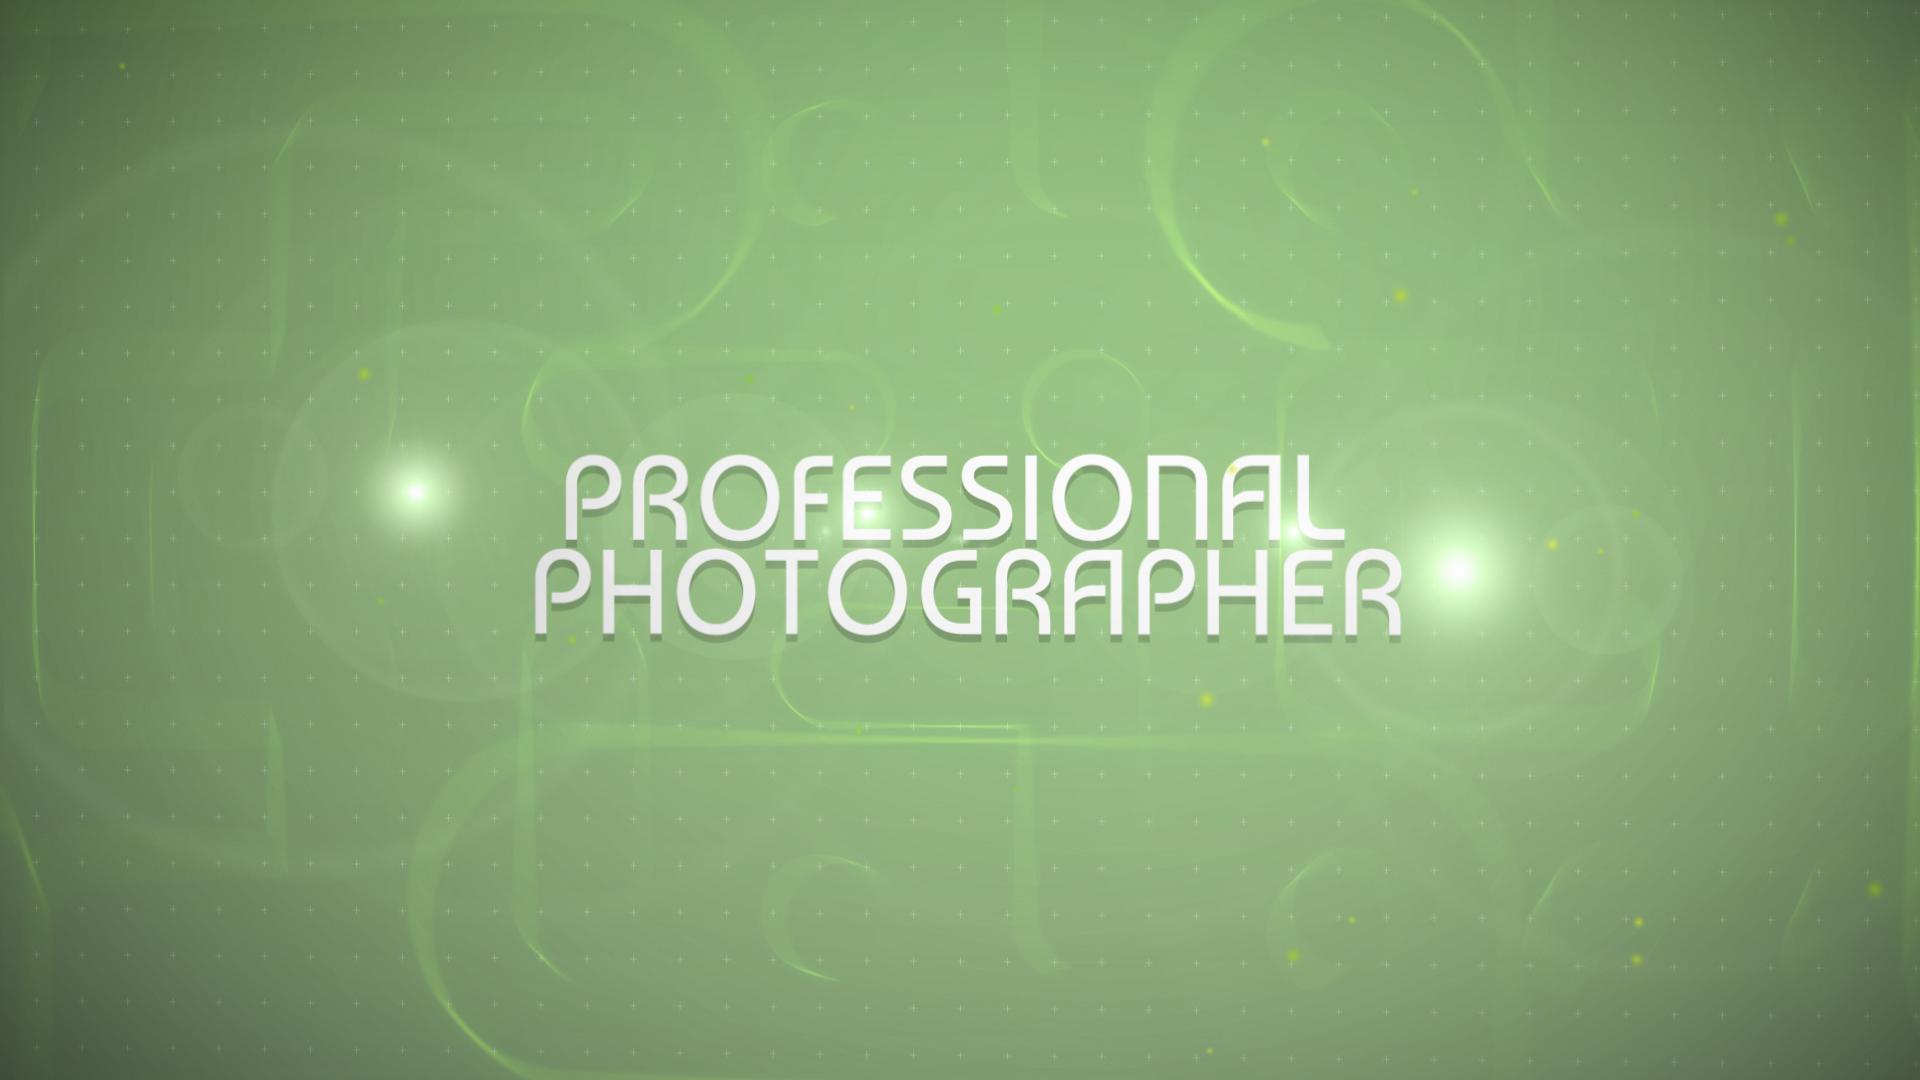 After Effects Intro #47309 para Sitio de Portafolios de fotógrafos